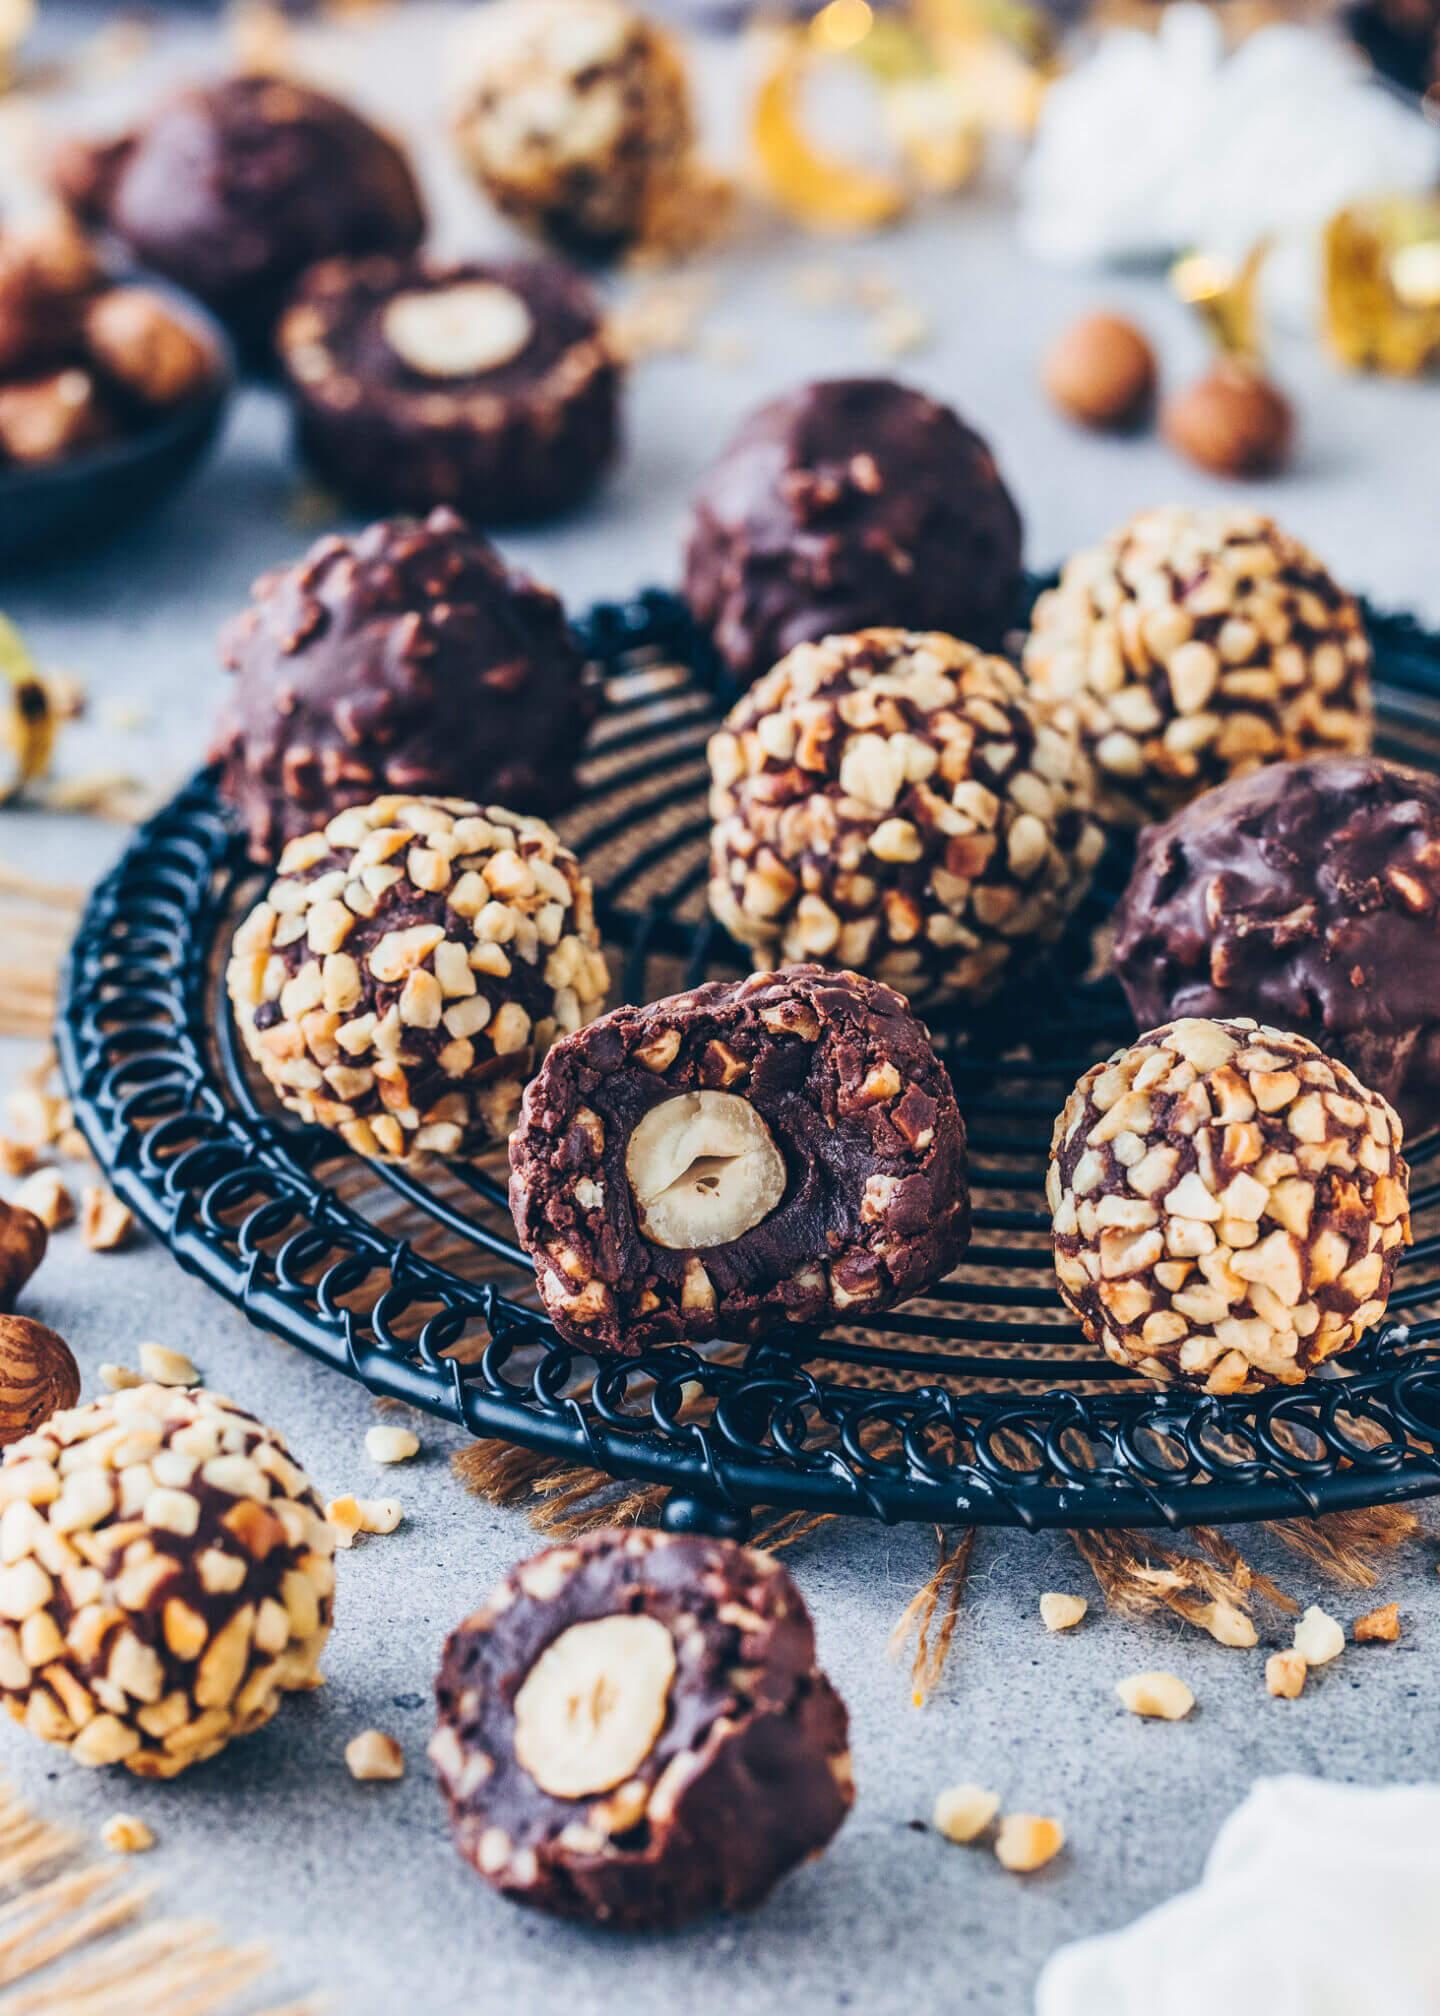 Haselnuss-Pralinen, Schokoladen-Trüffel, Vegane Rocher